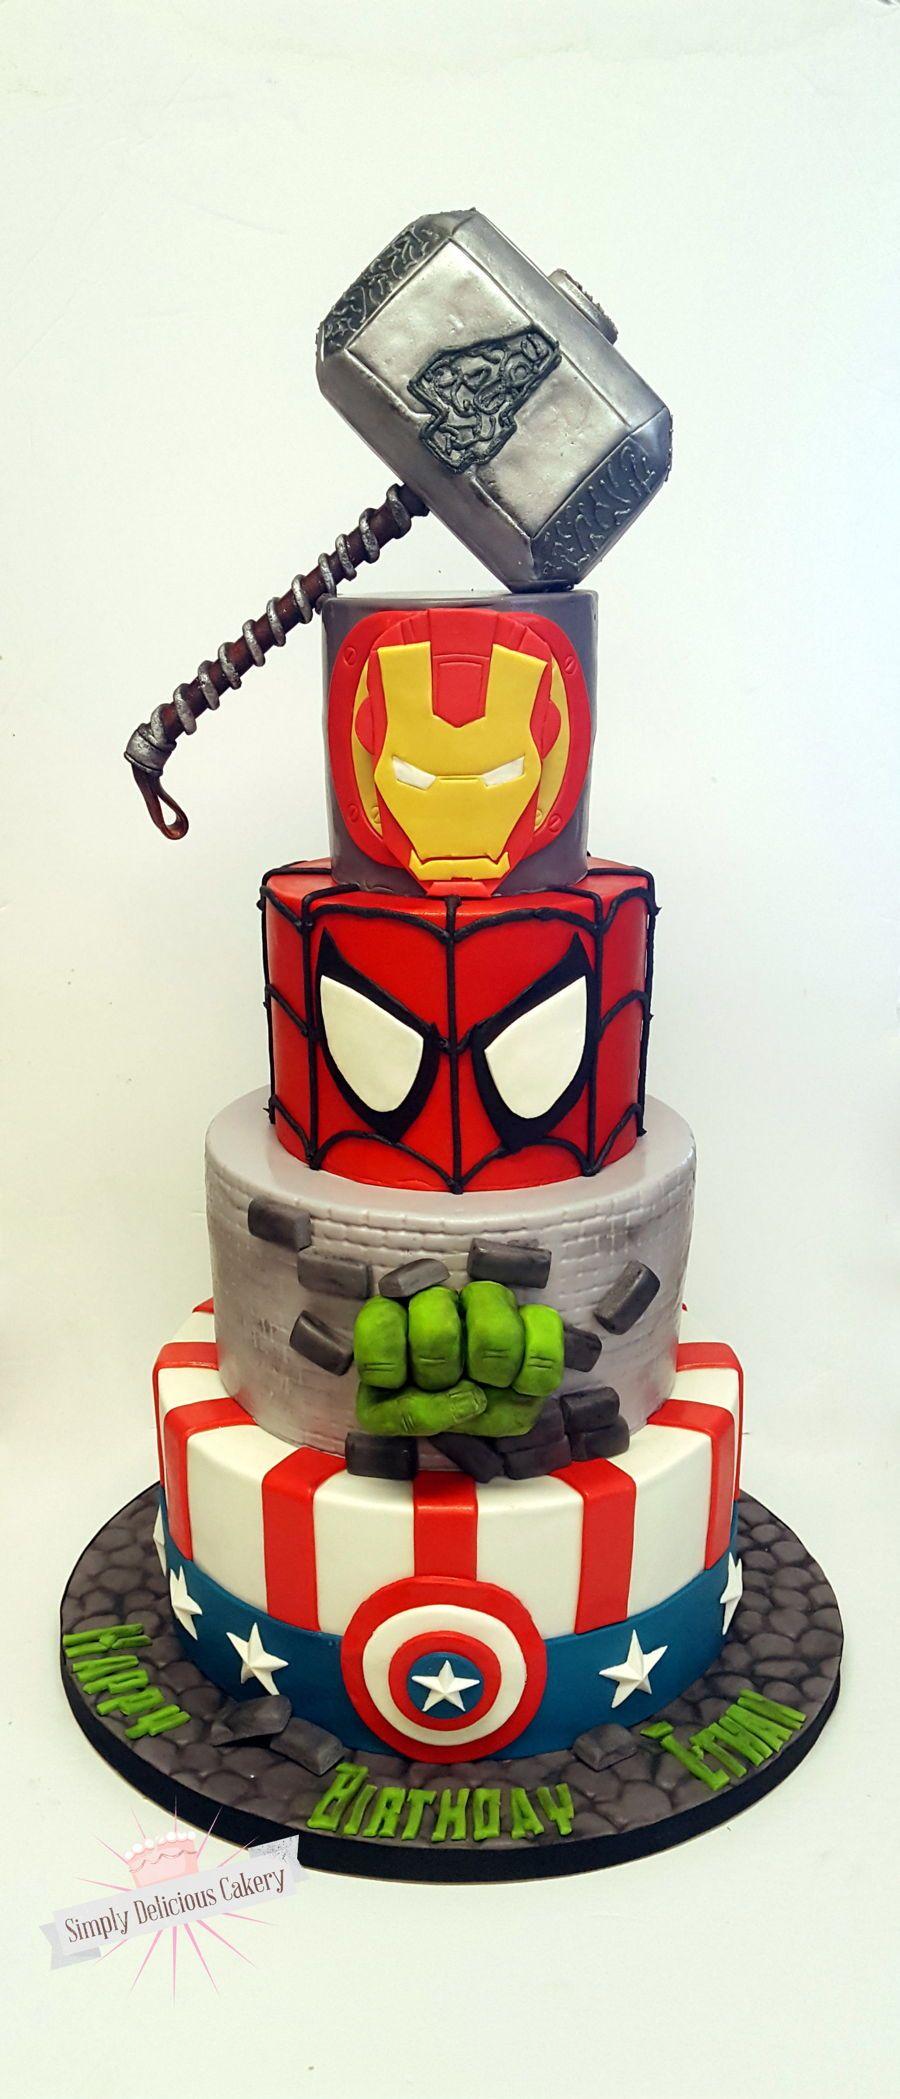 Phenomenal Marvel Avengers With Images Marvel Avengers Cake Marvel Funny Birthday Cards Online Drosicarndamsfinfo